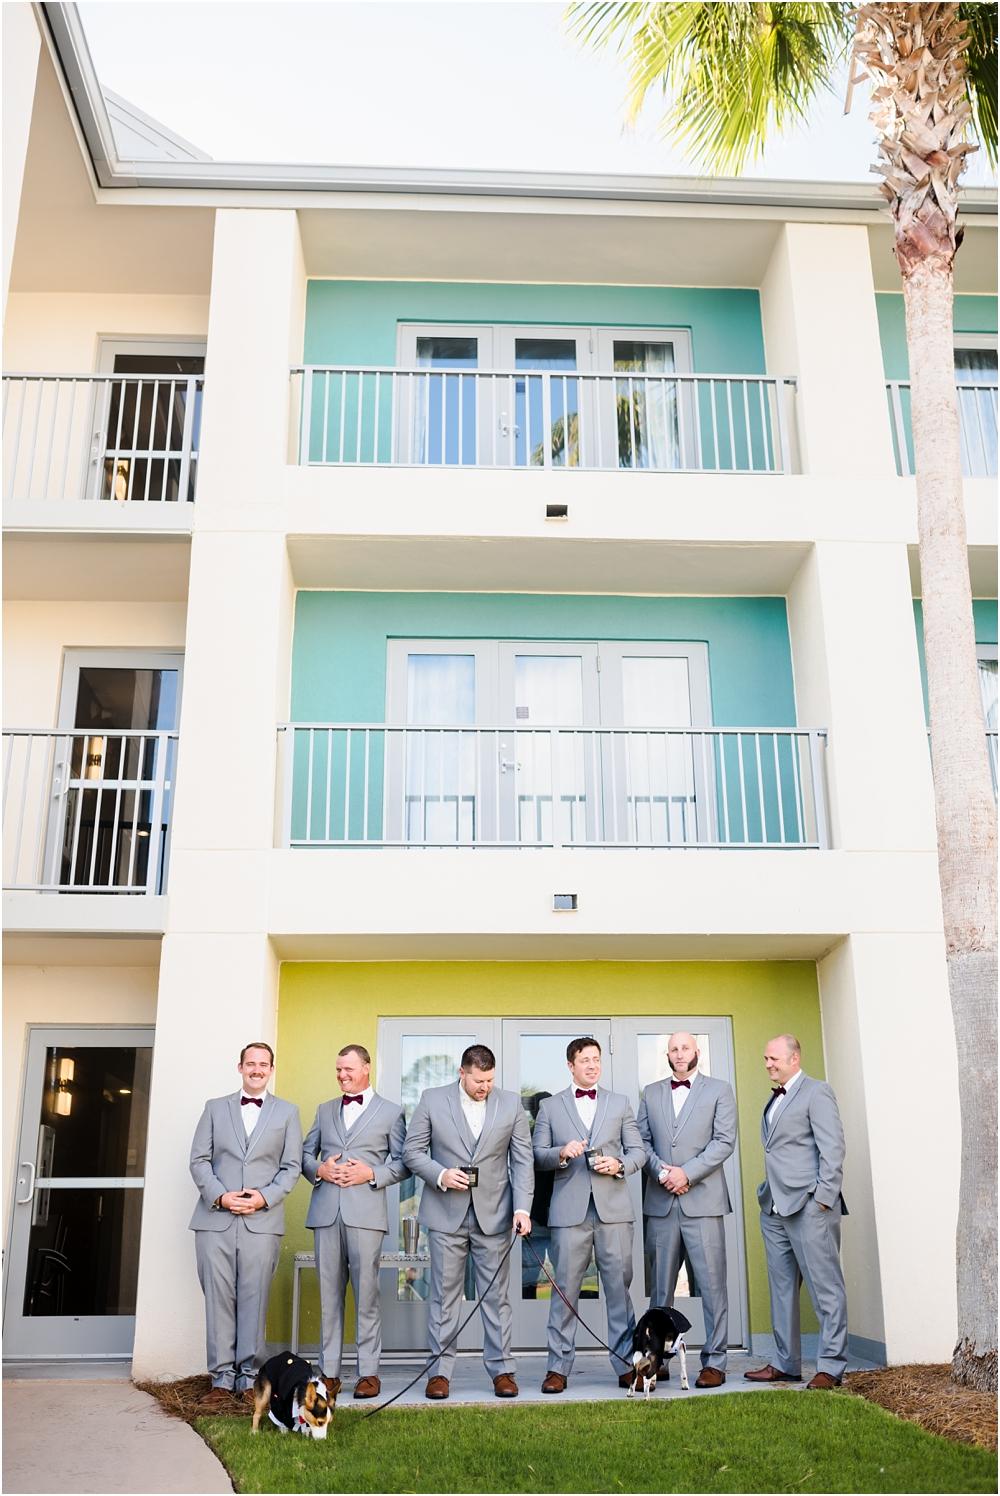 imhof-sheraton-panama-city-beach-florida-wedding-photographer-kiersten-grant-40.jpg